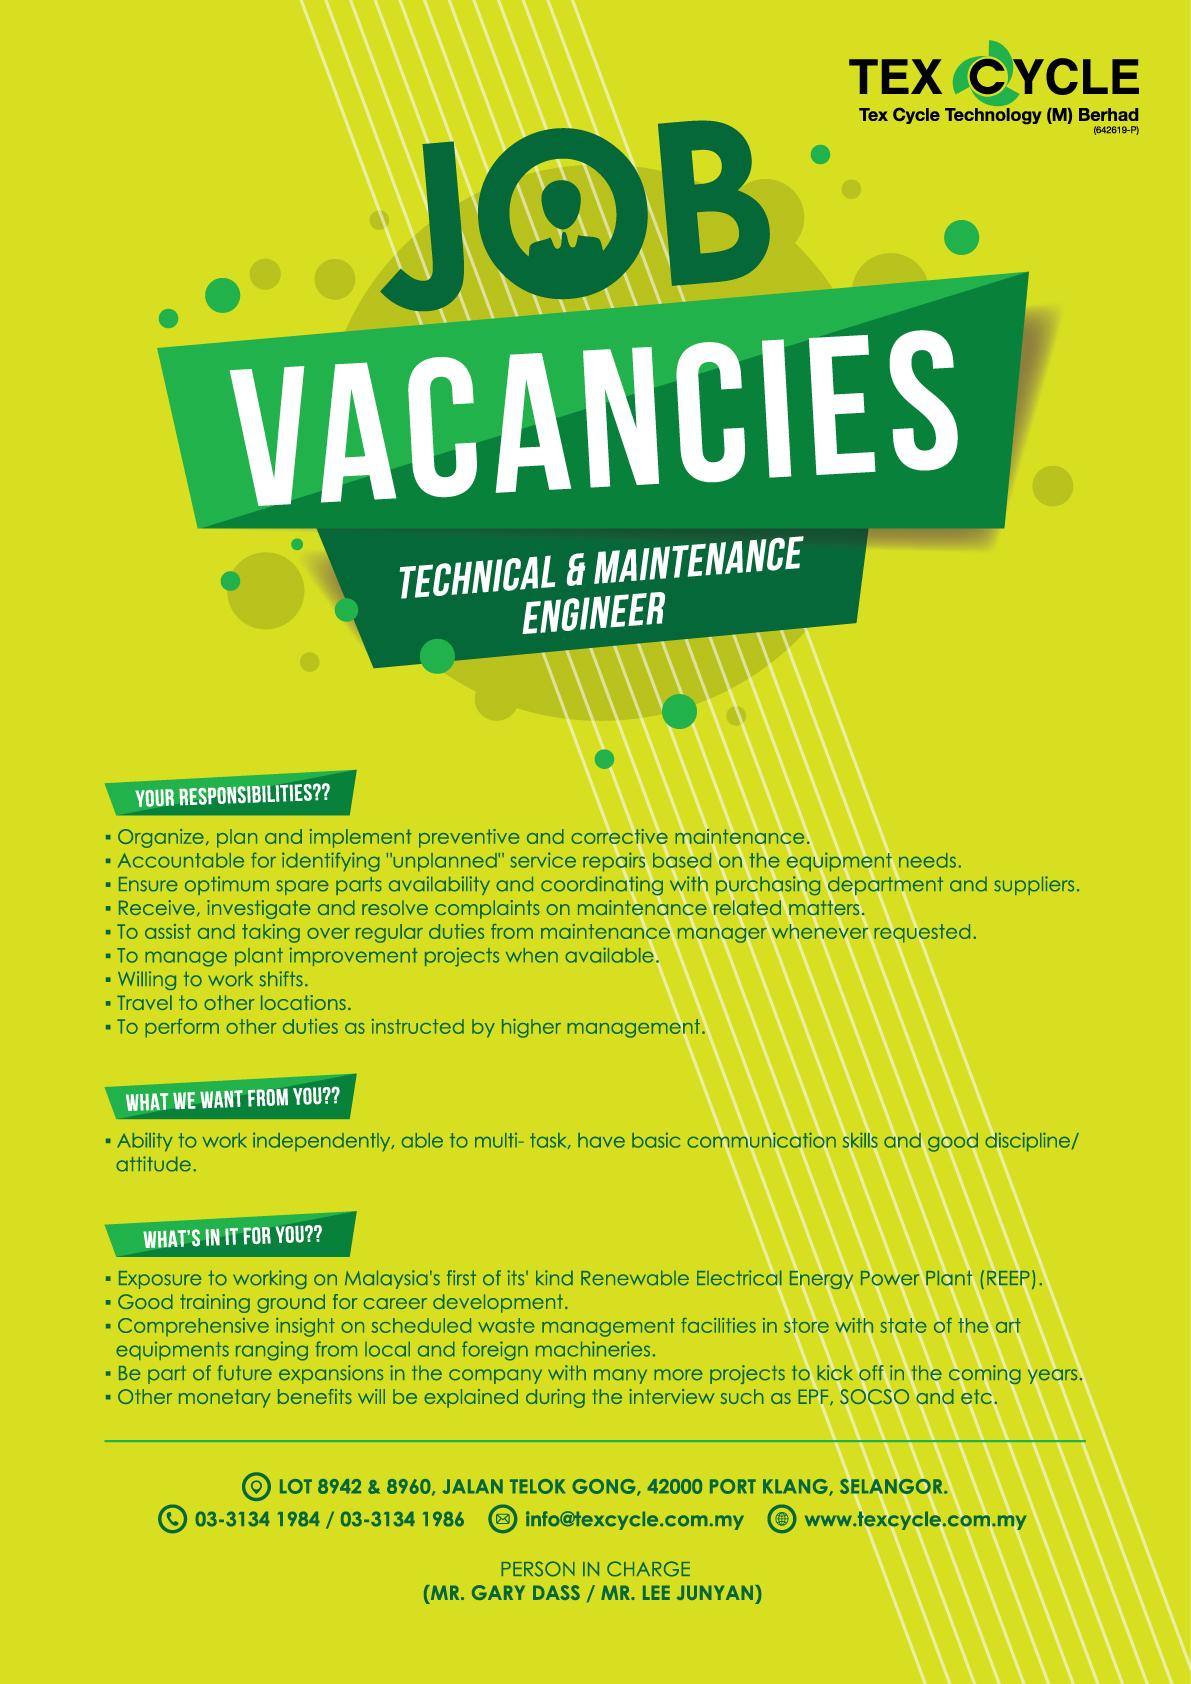 Job Vacancies Advertisement Tex Cycle